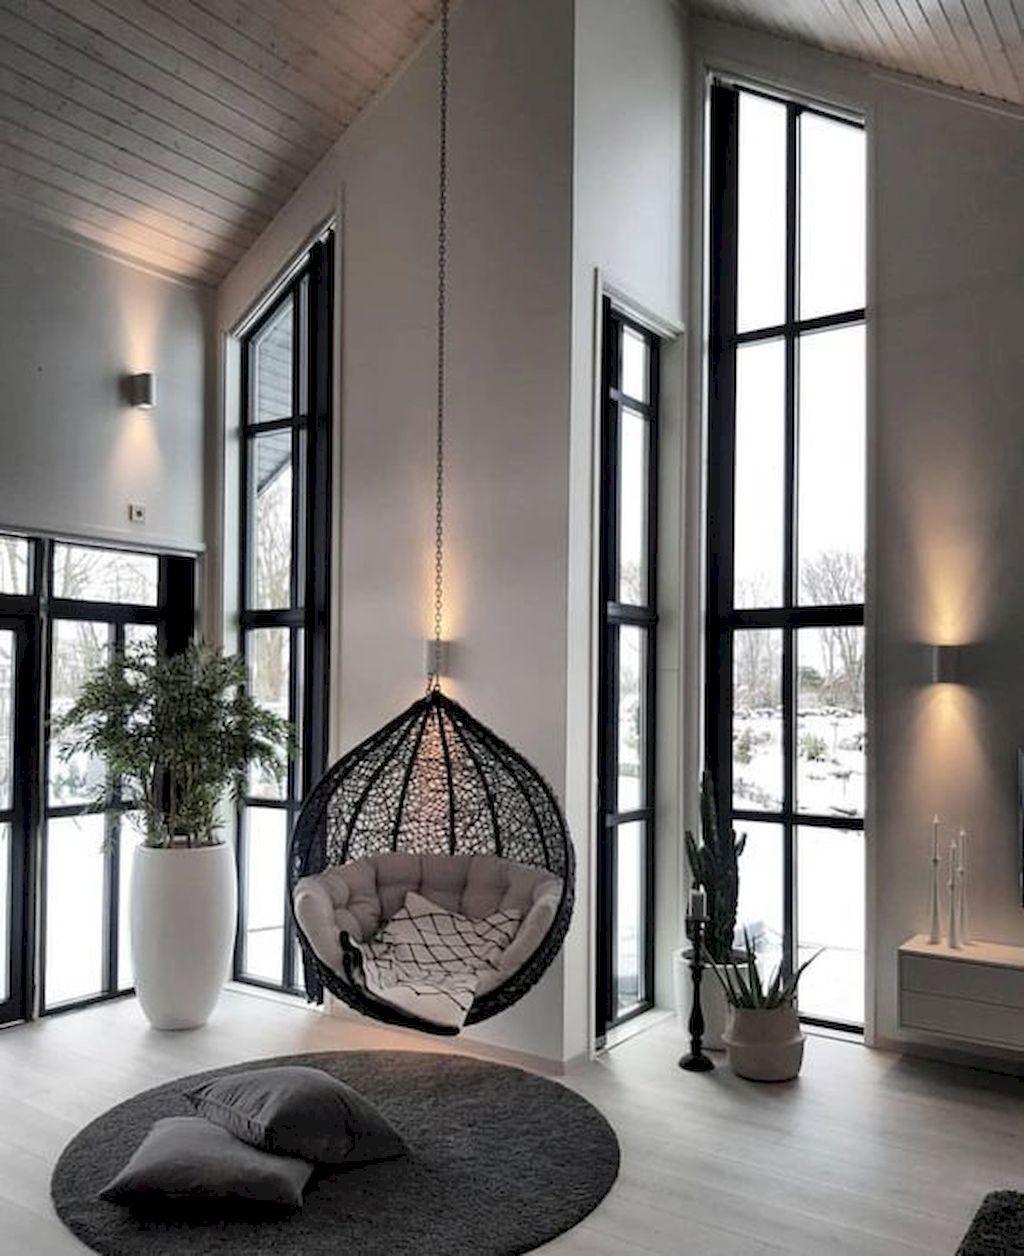 Photo of Elegant Modern Living Room Design and Decor Ideas 27 – HomeIdeas.co